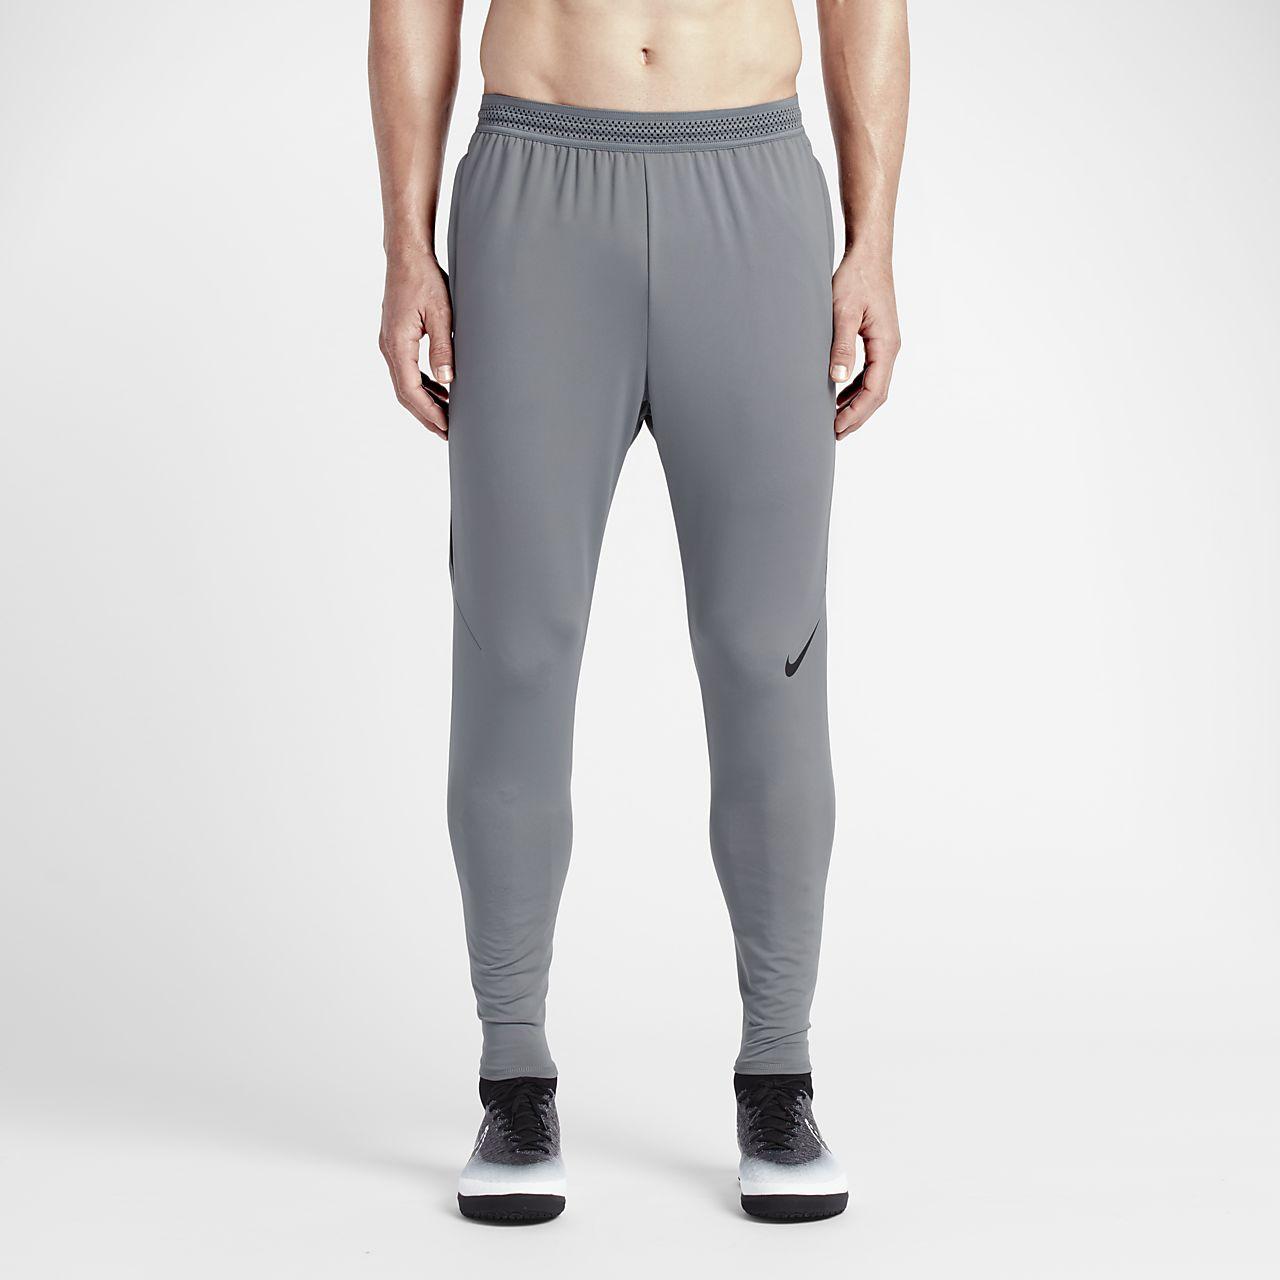 new product a2fa6 5deb9 Pants Se Nike Dry Strike Mens Football xqIwYIfgP